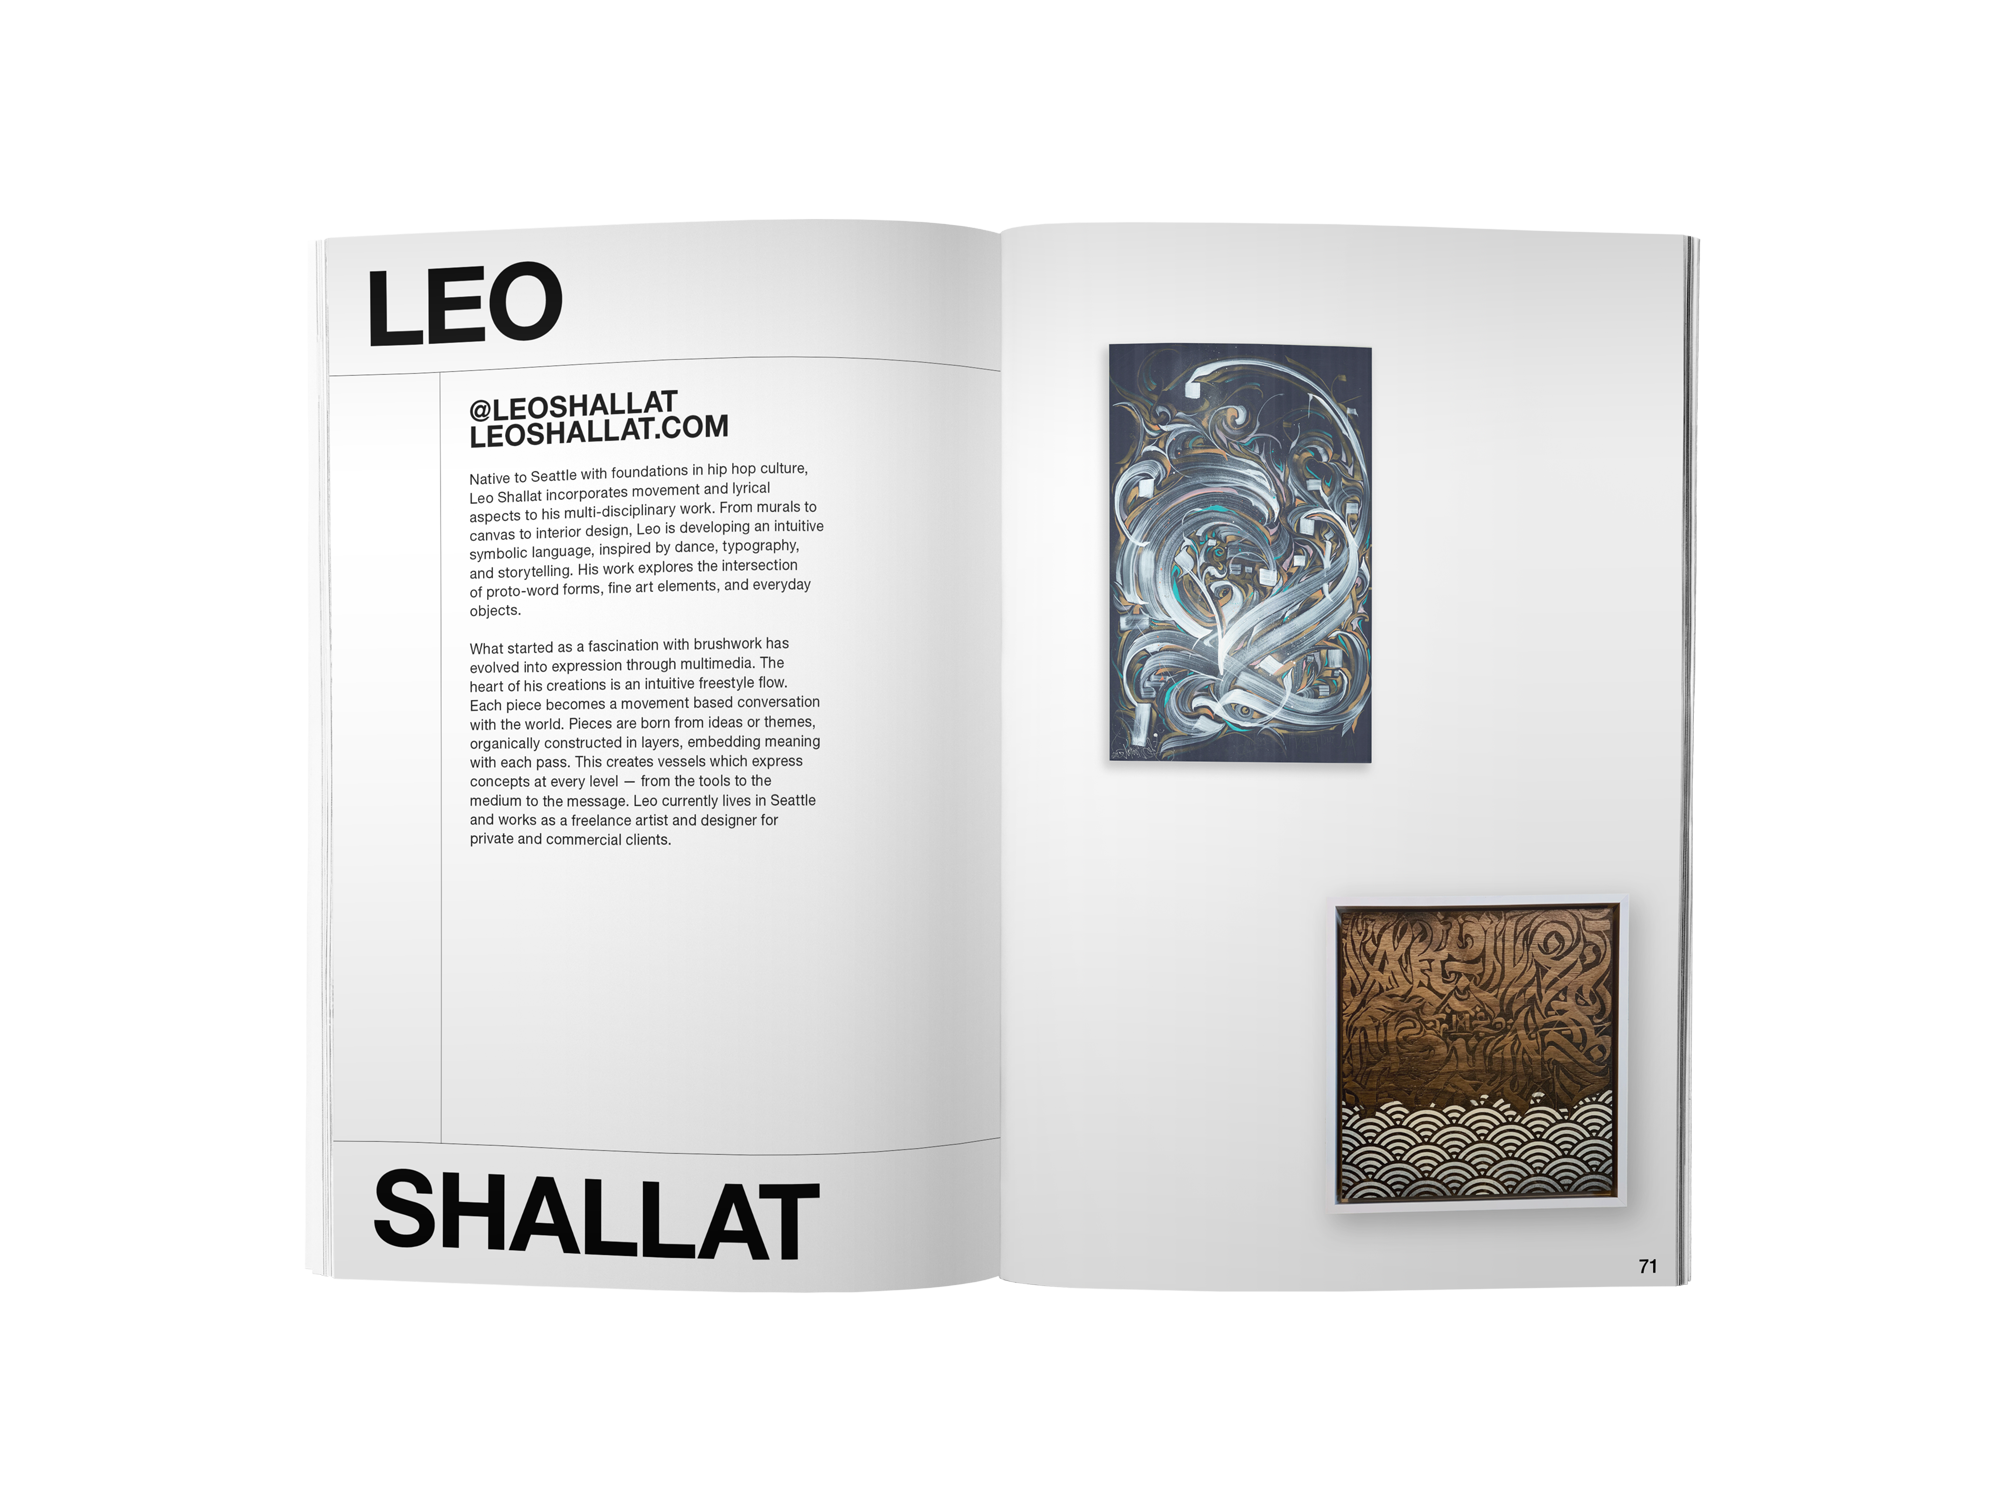 leo-shallat.png